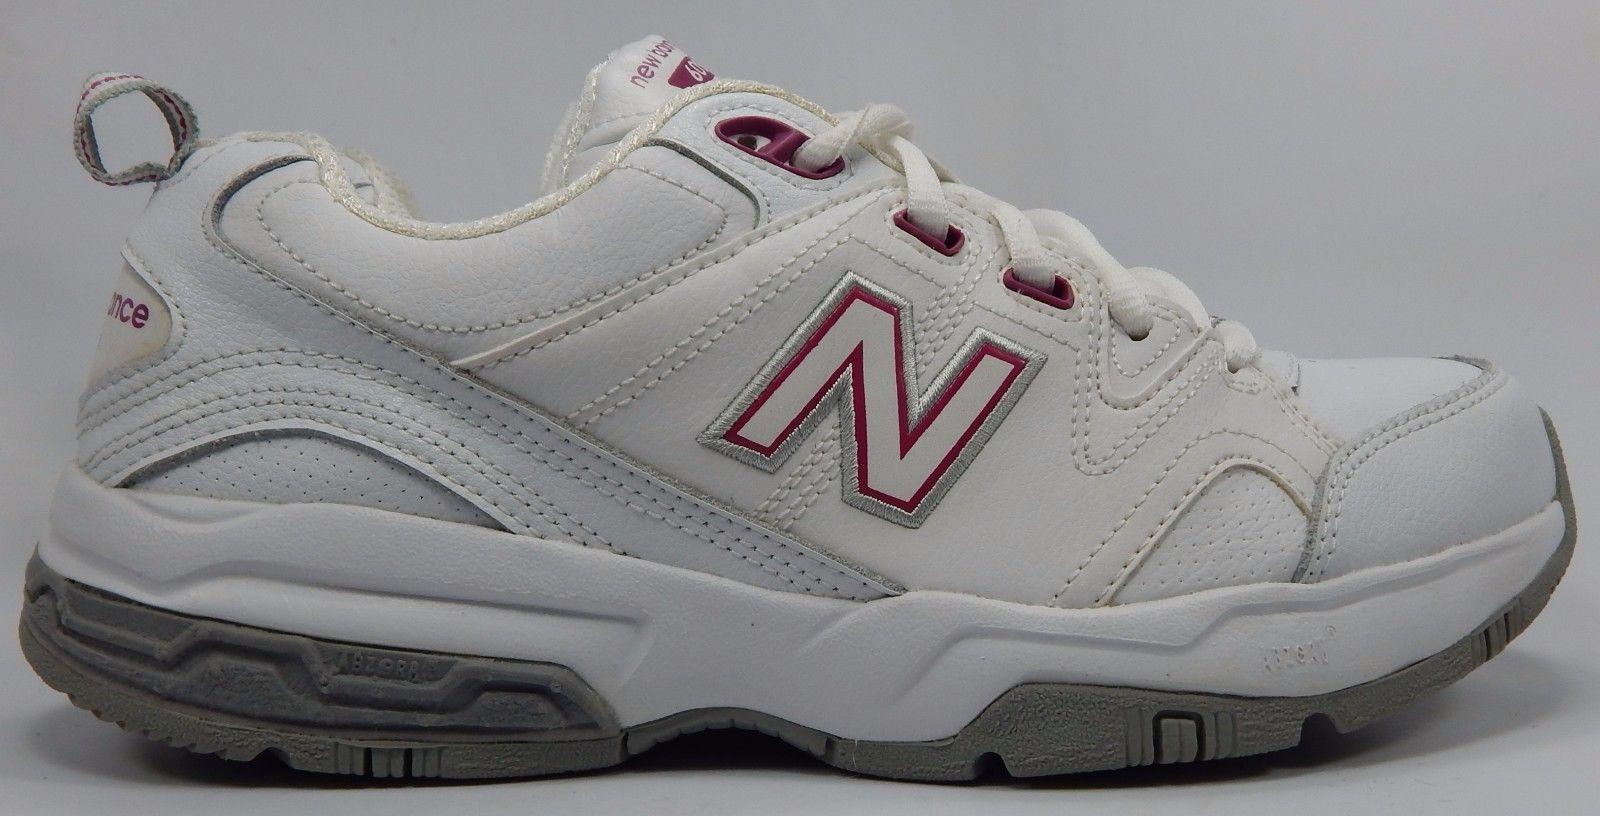 New Balance 609 v2 Women's Cross Training Shoes Sz US 10 M (B) EU 41.5 WX609CS2